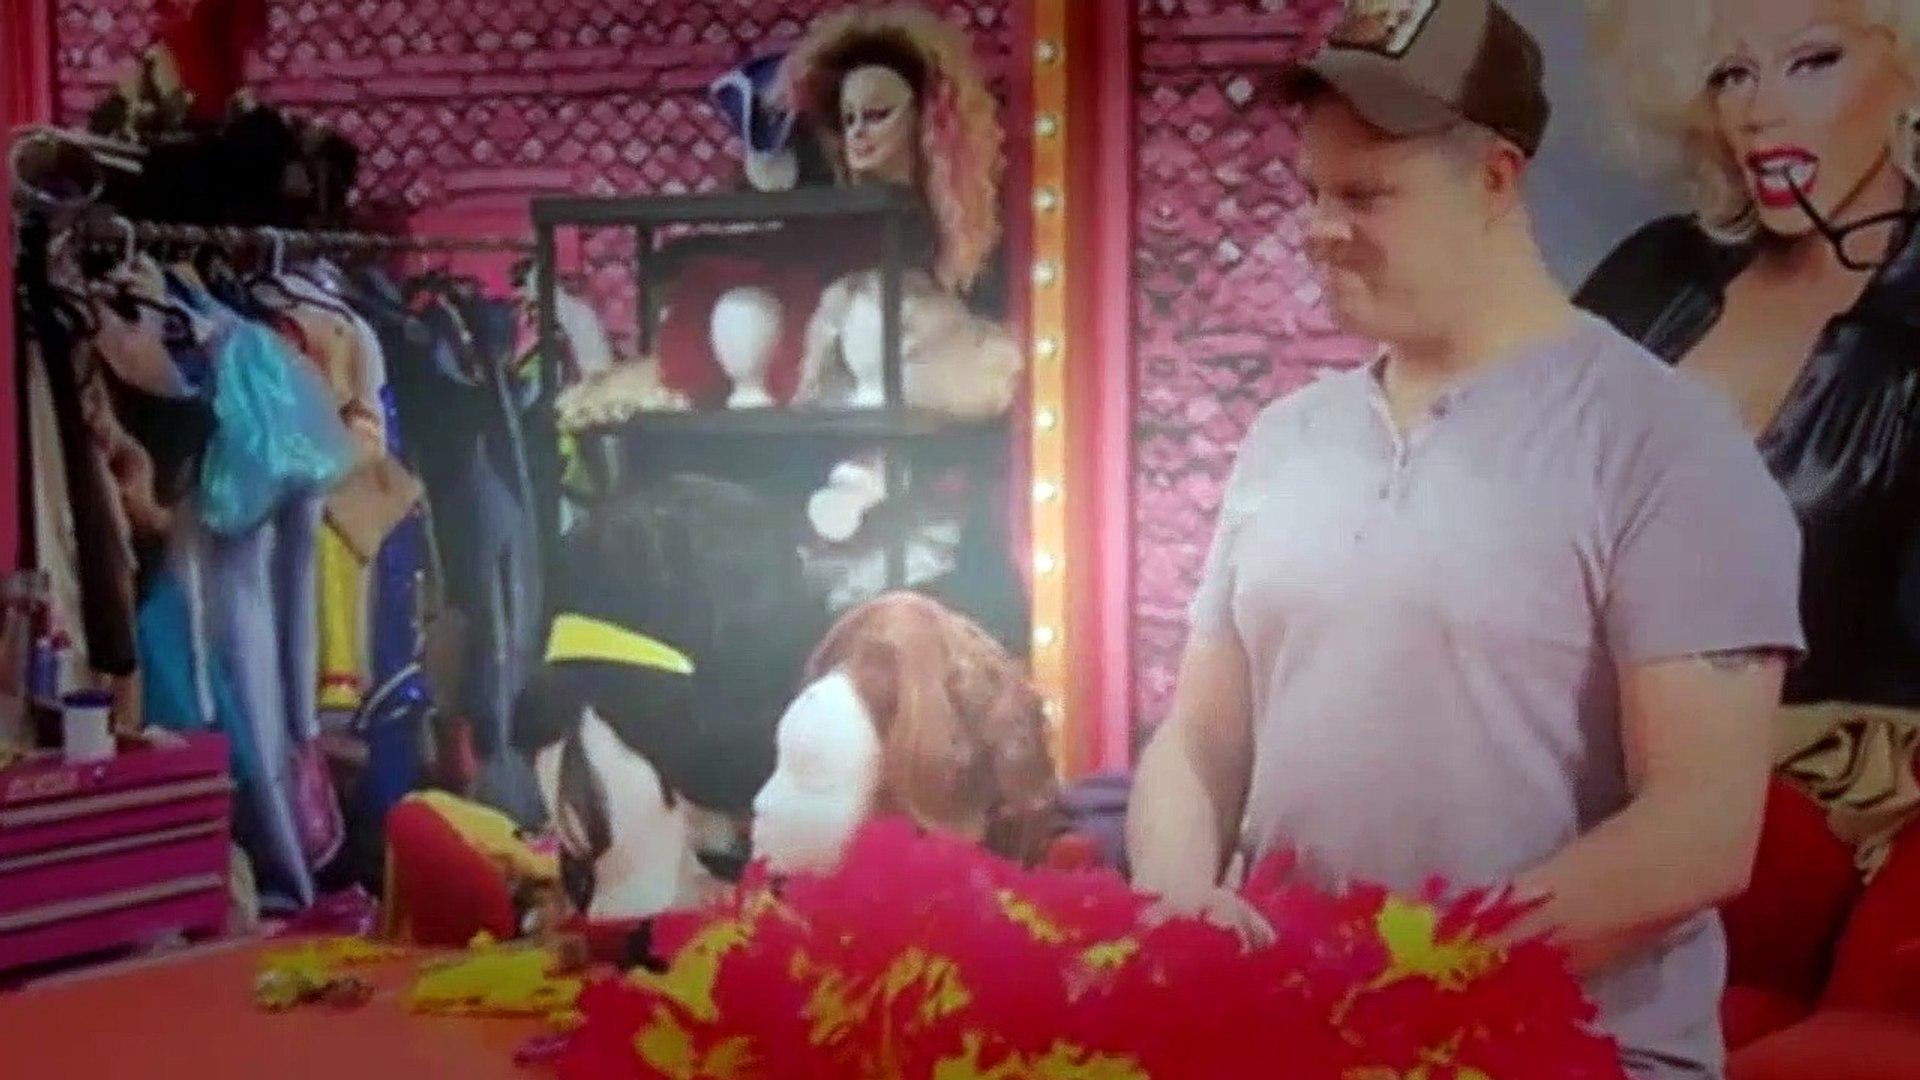 rupaul season 11 episode 8 watch online free